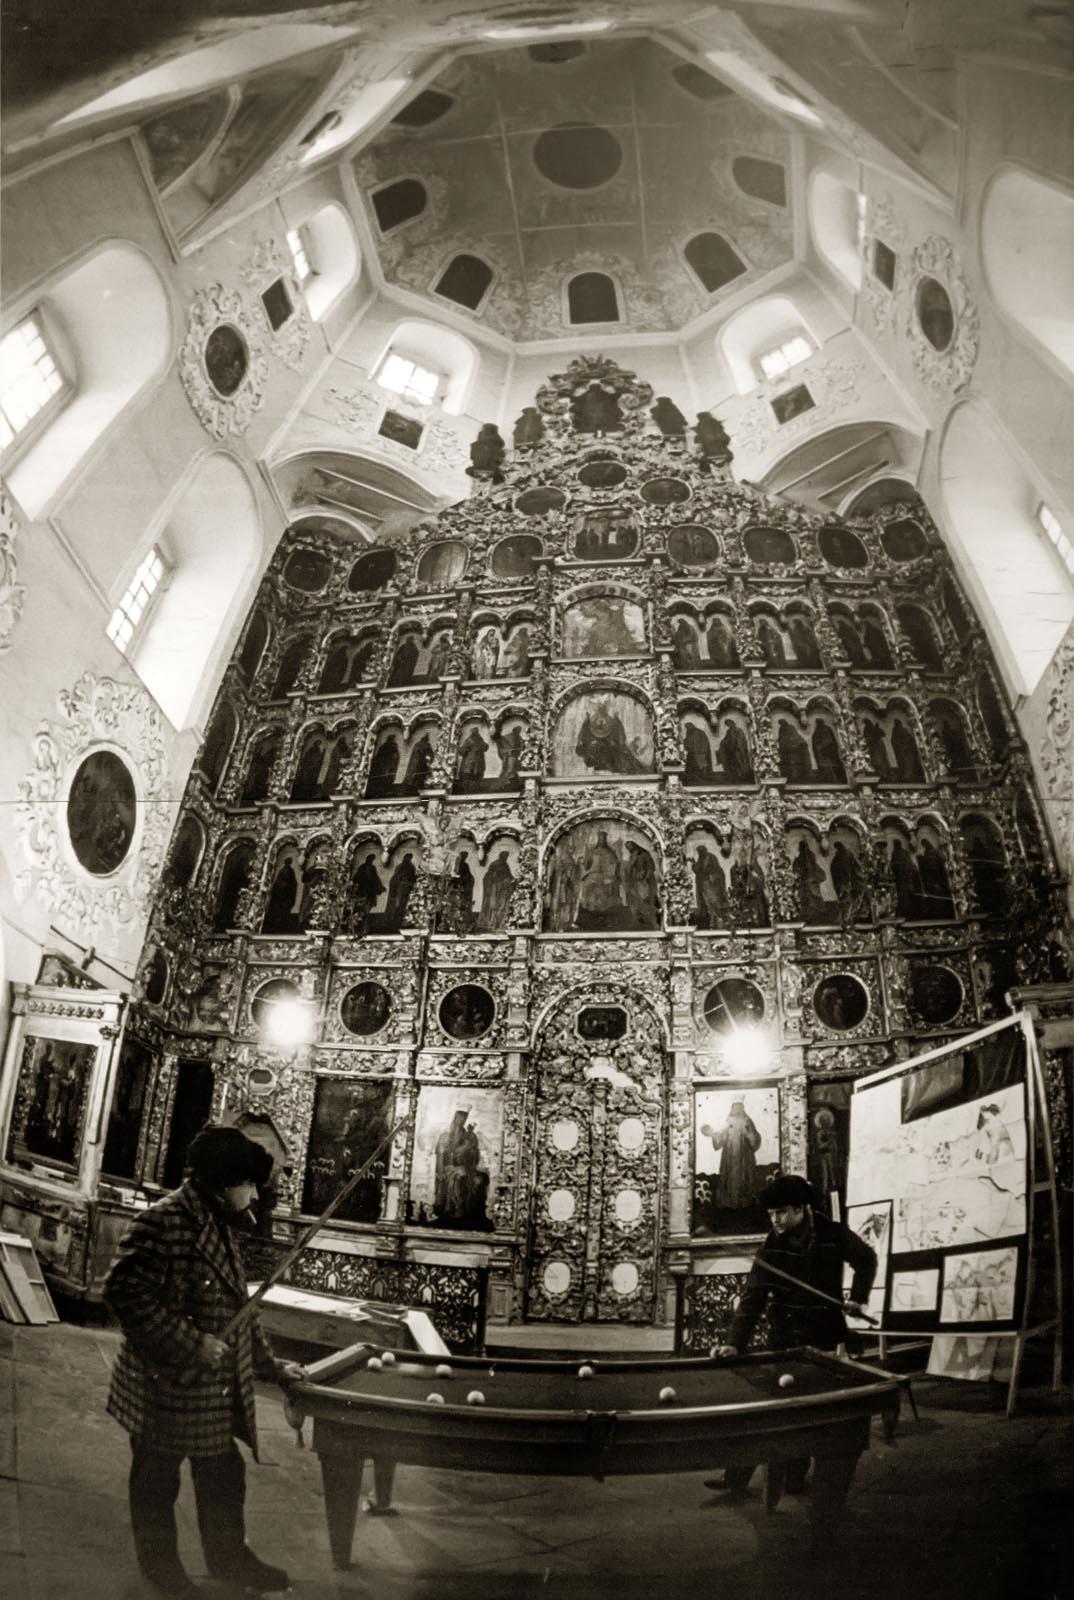 Фото №272554. В.Зотов. СОБОР ПЕТРА И ПАВЛА. Казань. 1983